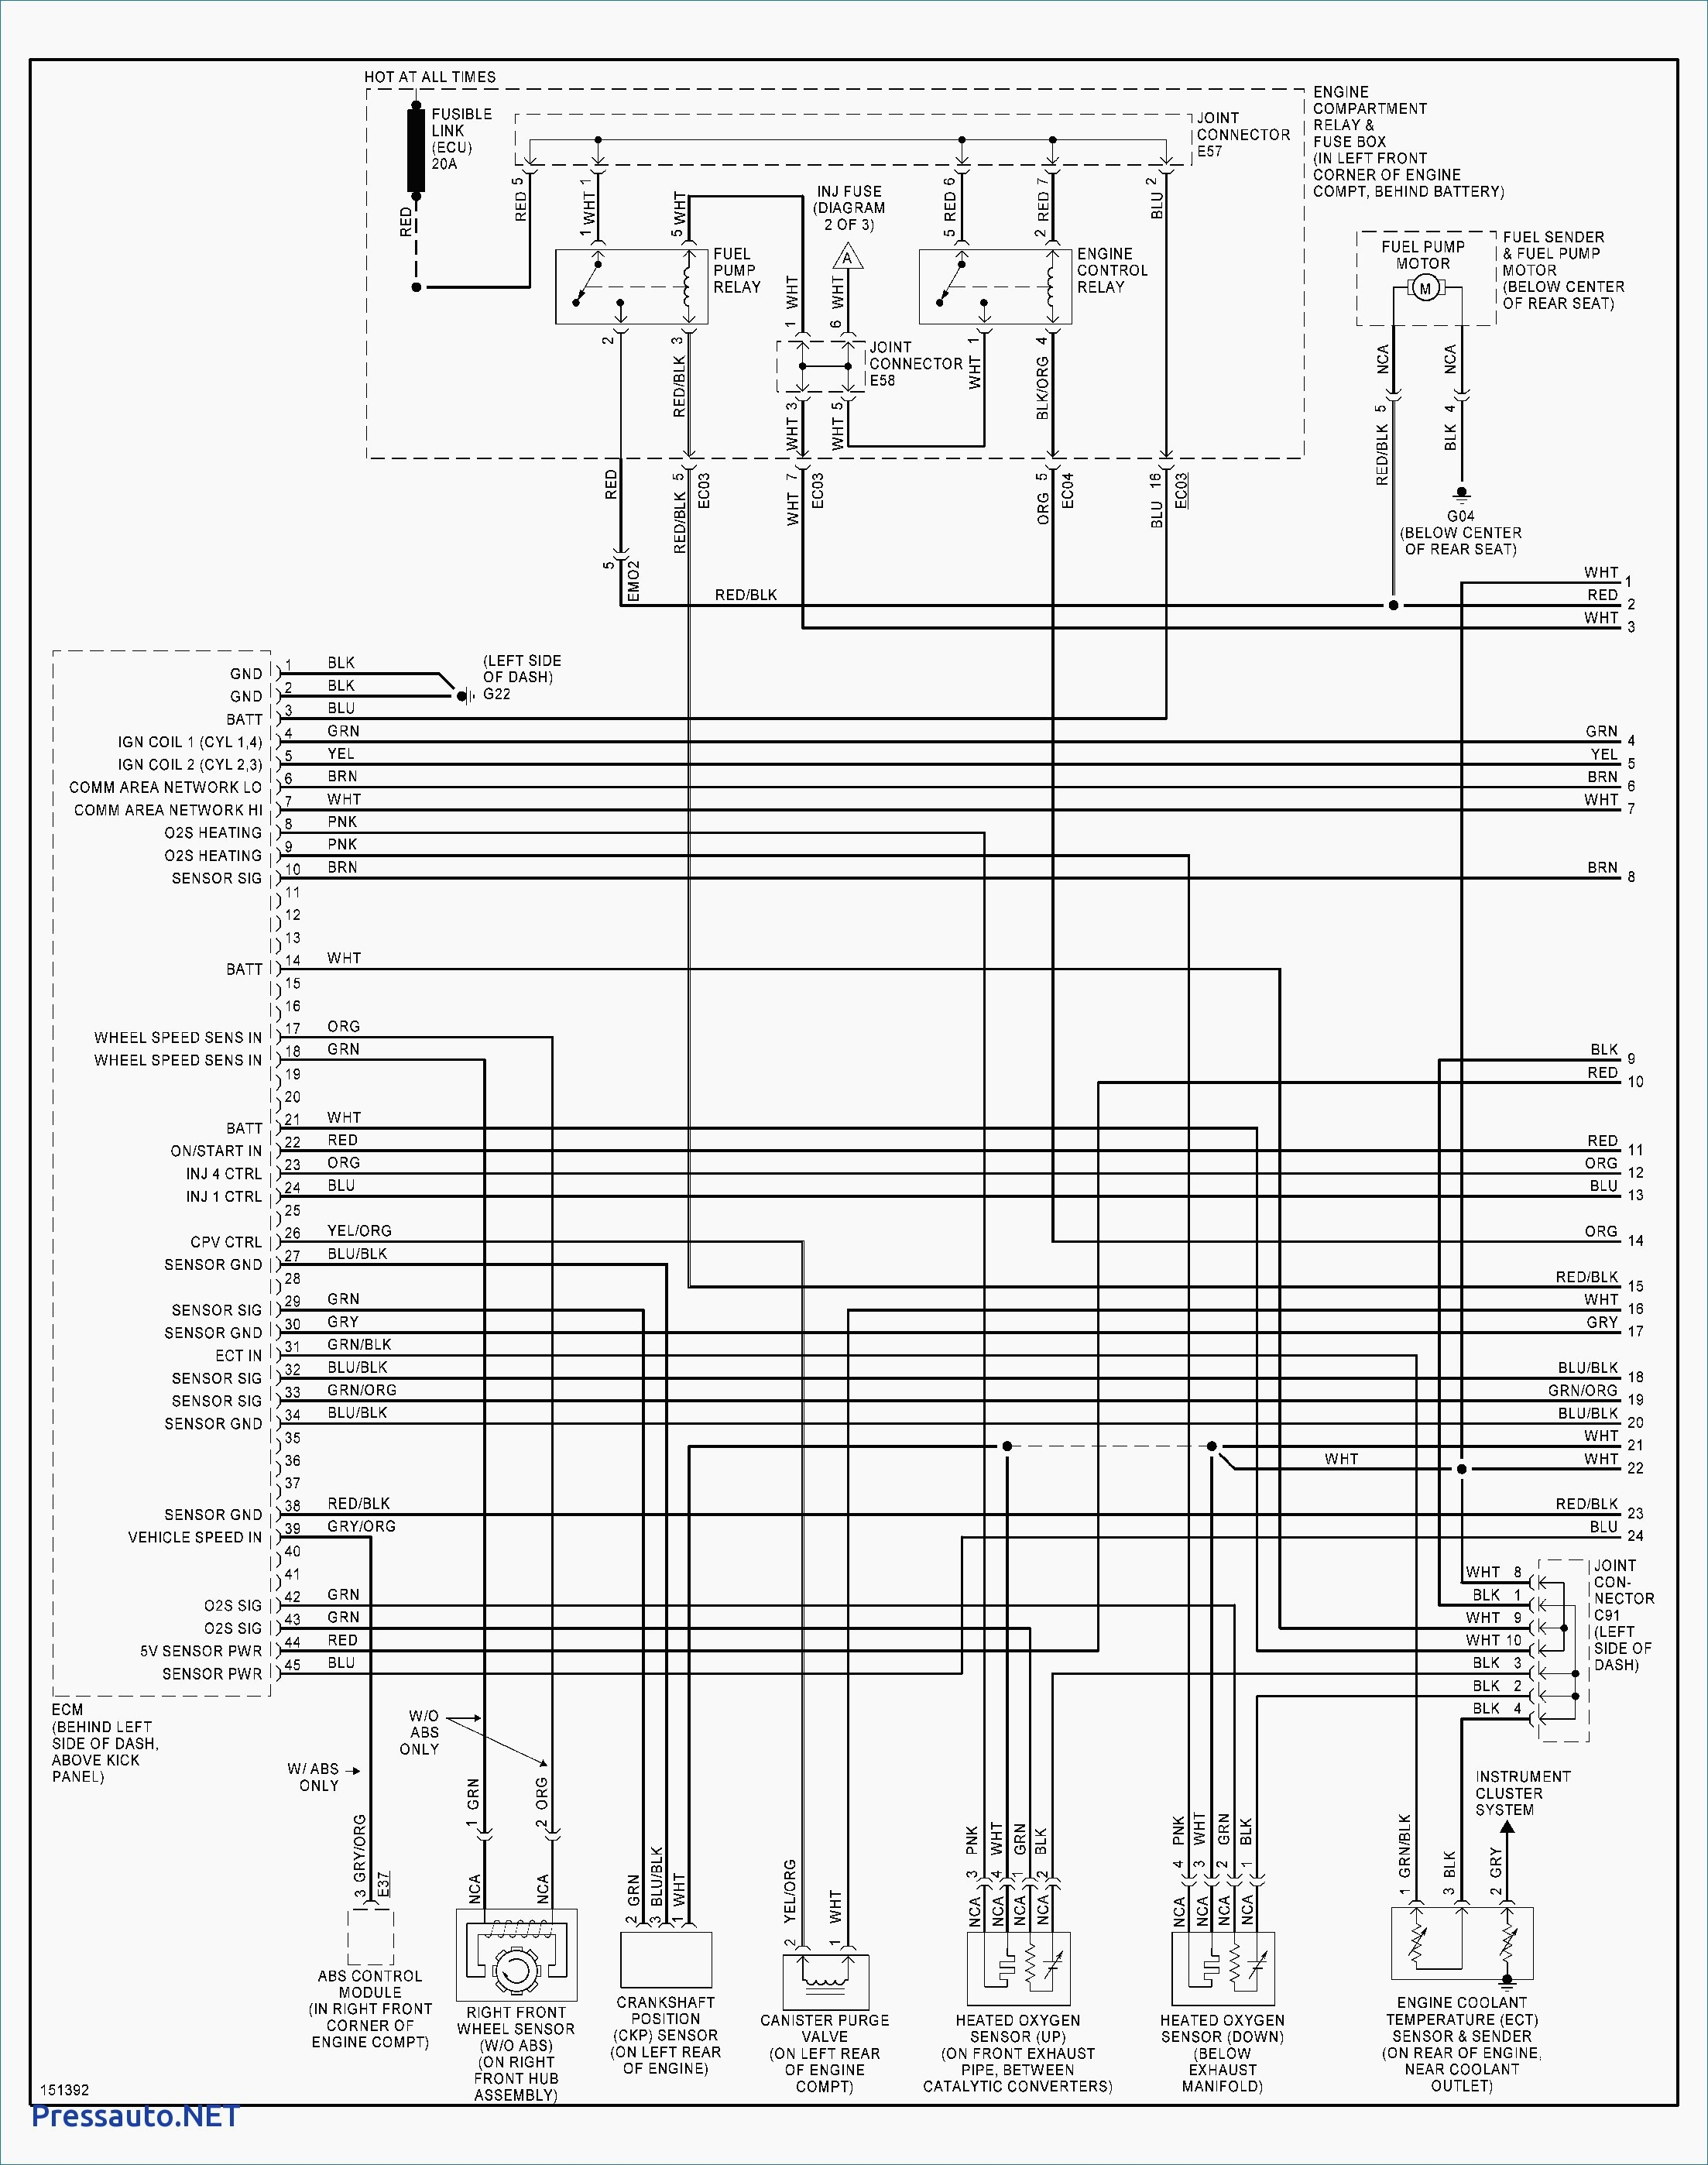 Hyundai Sonata Wiring Harness Pinout - Wiring Diagram Table on wiring diagrams, computer schematics, thermostat schematics, power supply schematics, valve schematics, motor schematics, water pump schematics, door handle schematics,